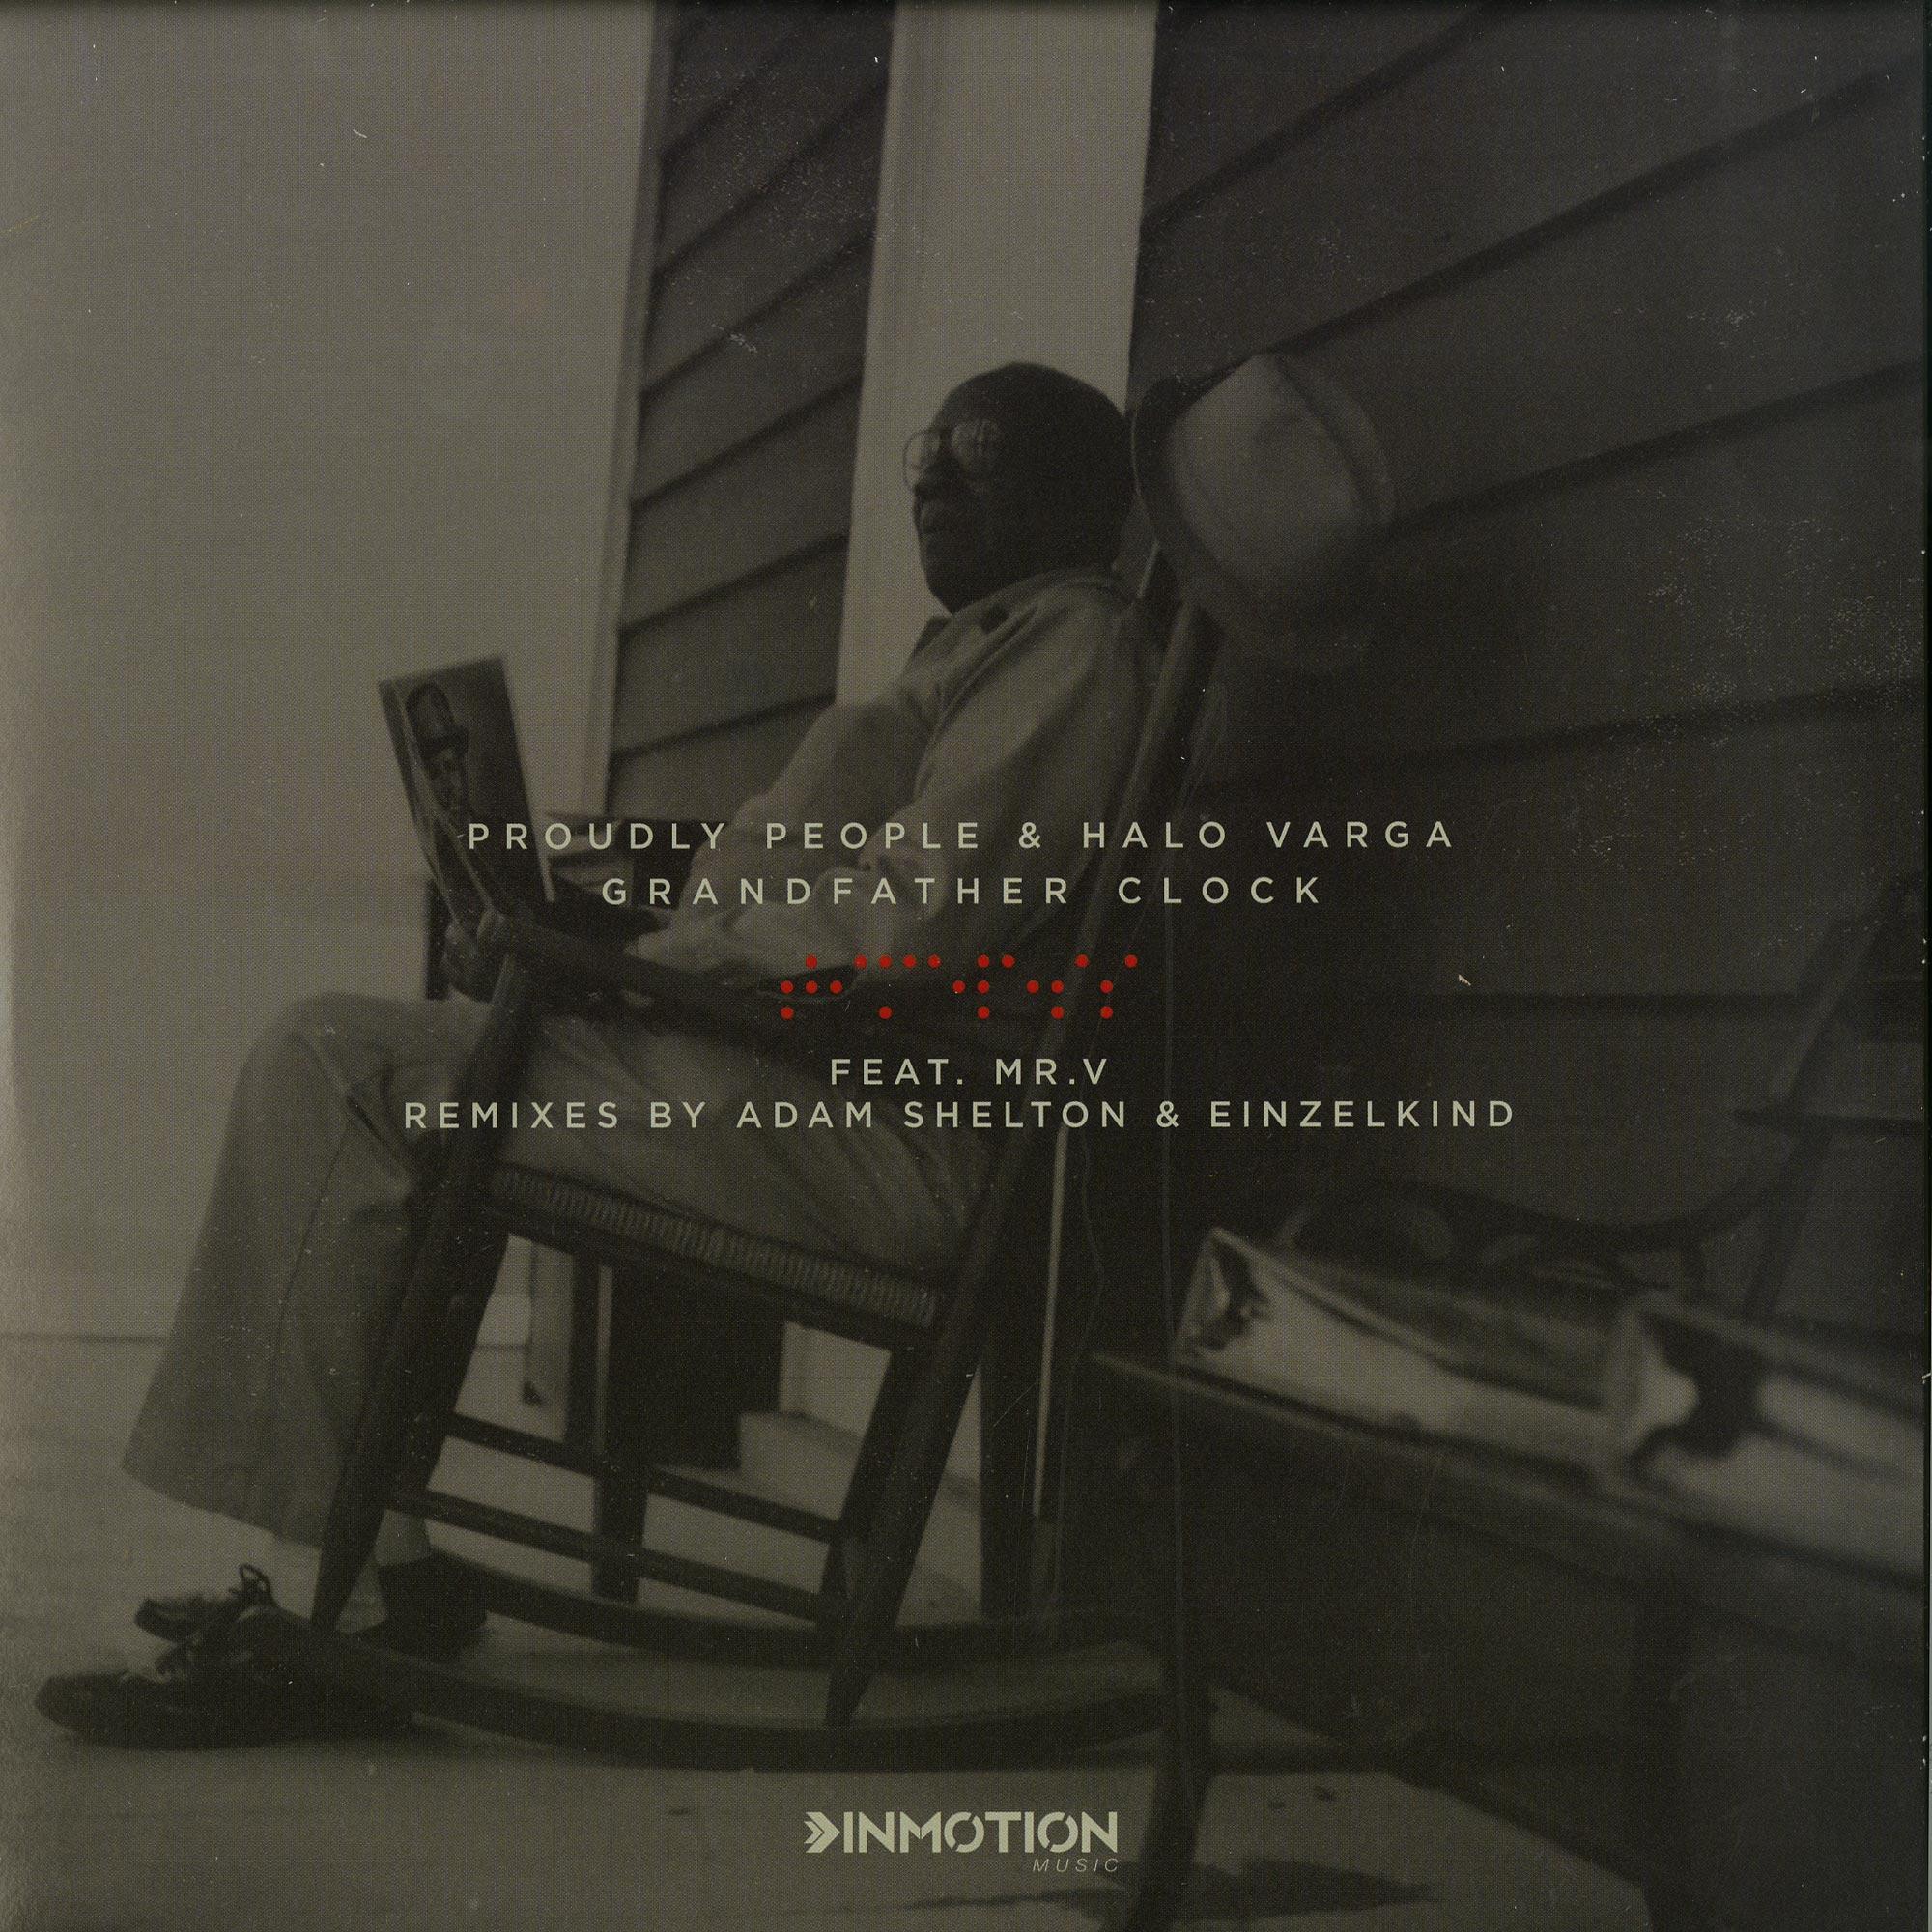 Proudly People & Halo Varga - GRANDFATHER CLOCK EP